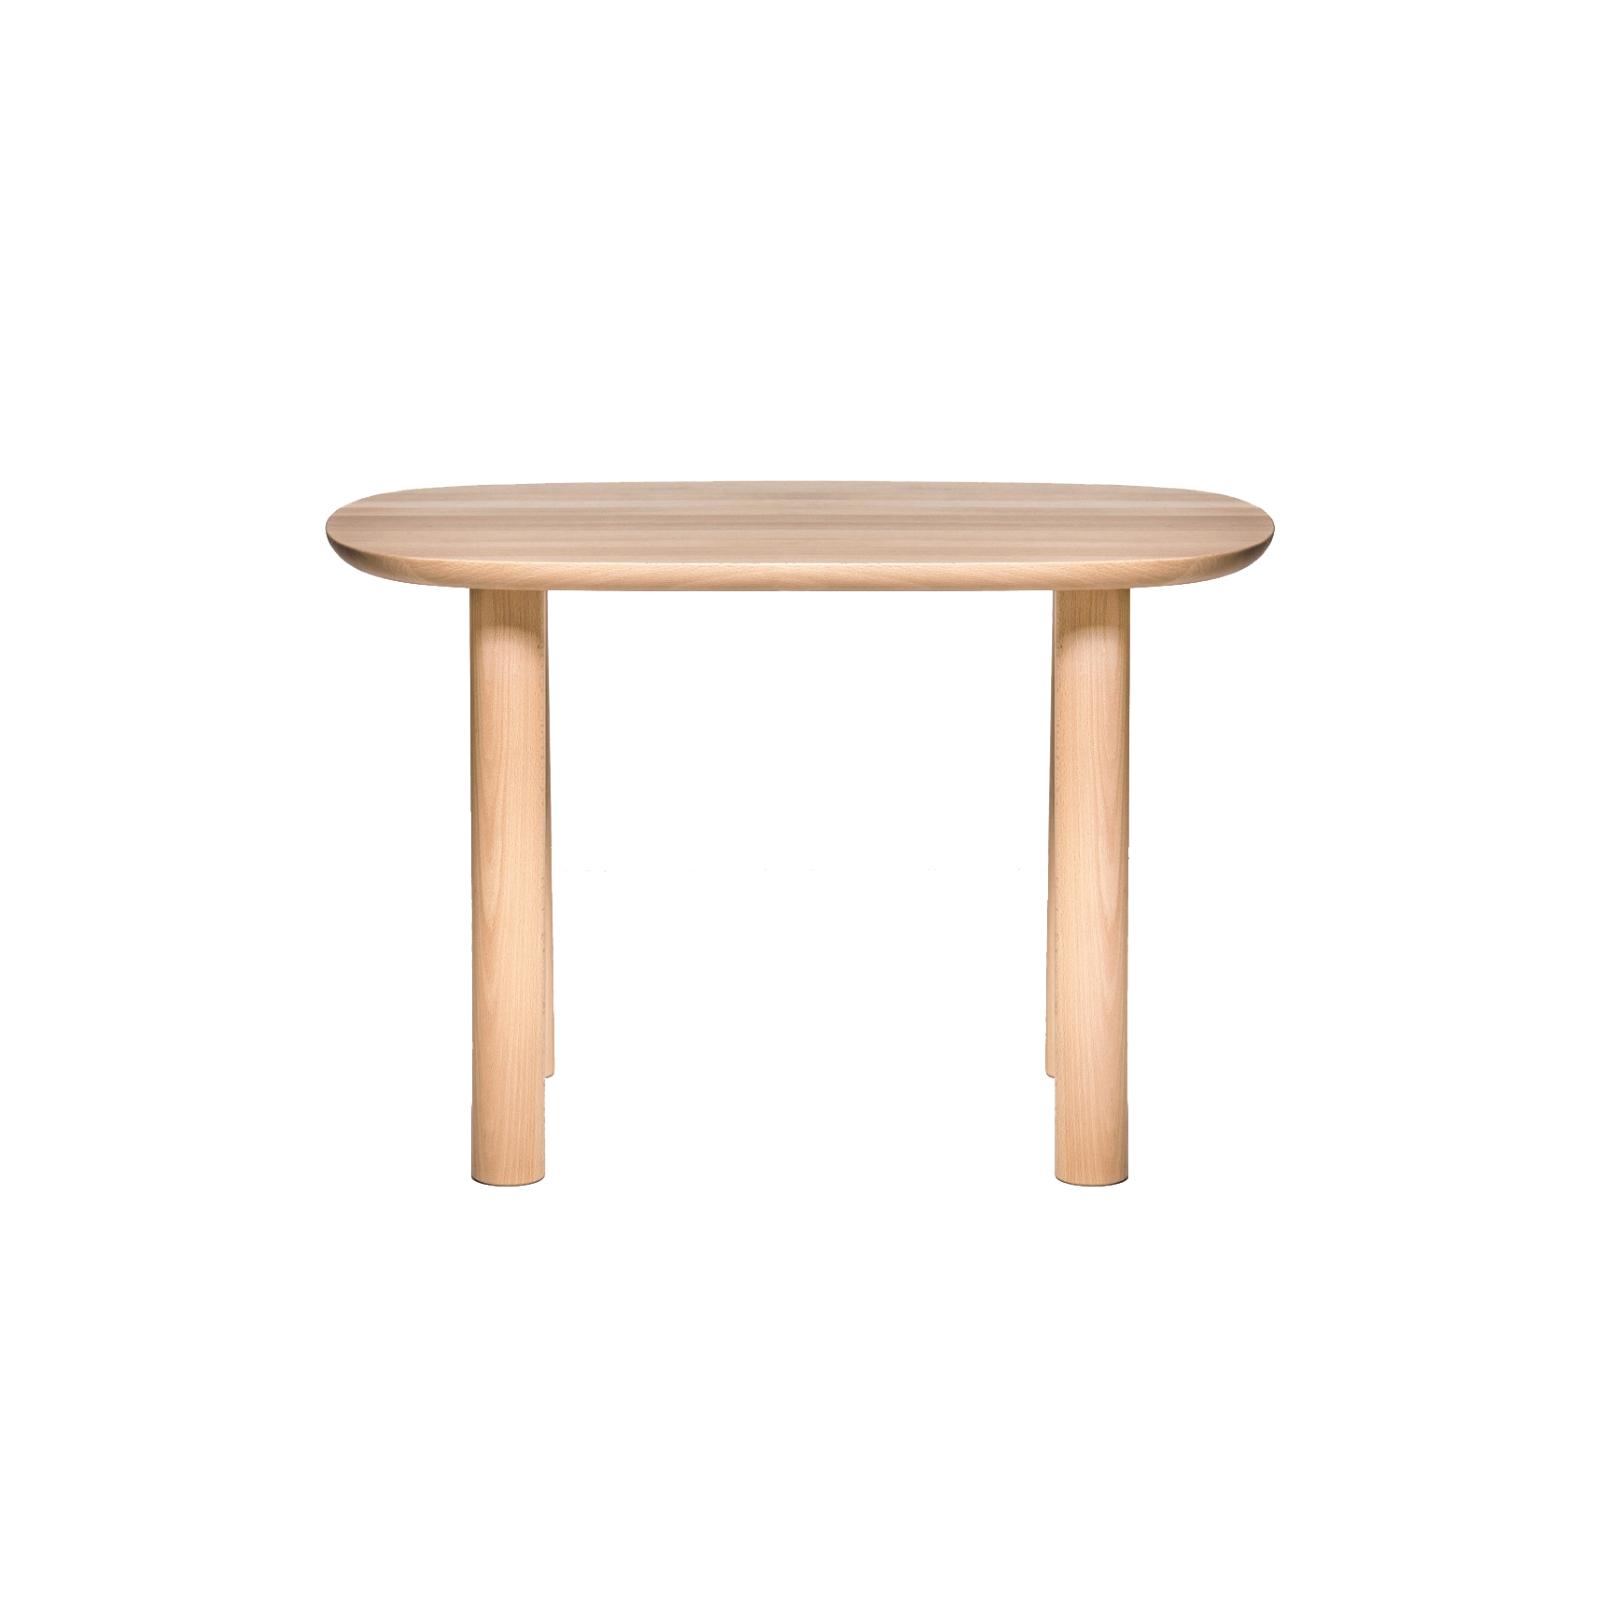 ELEPHANT TABLE barnbord, Elements Optimal